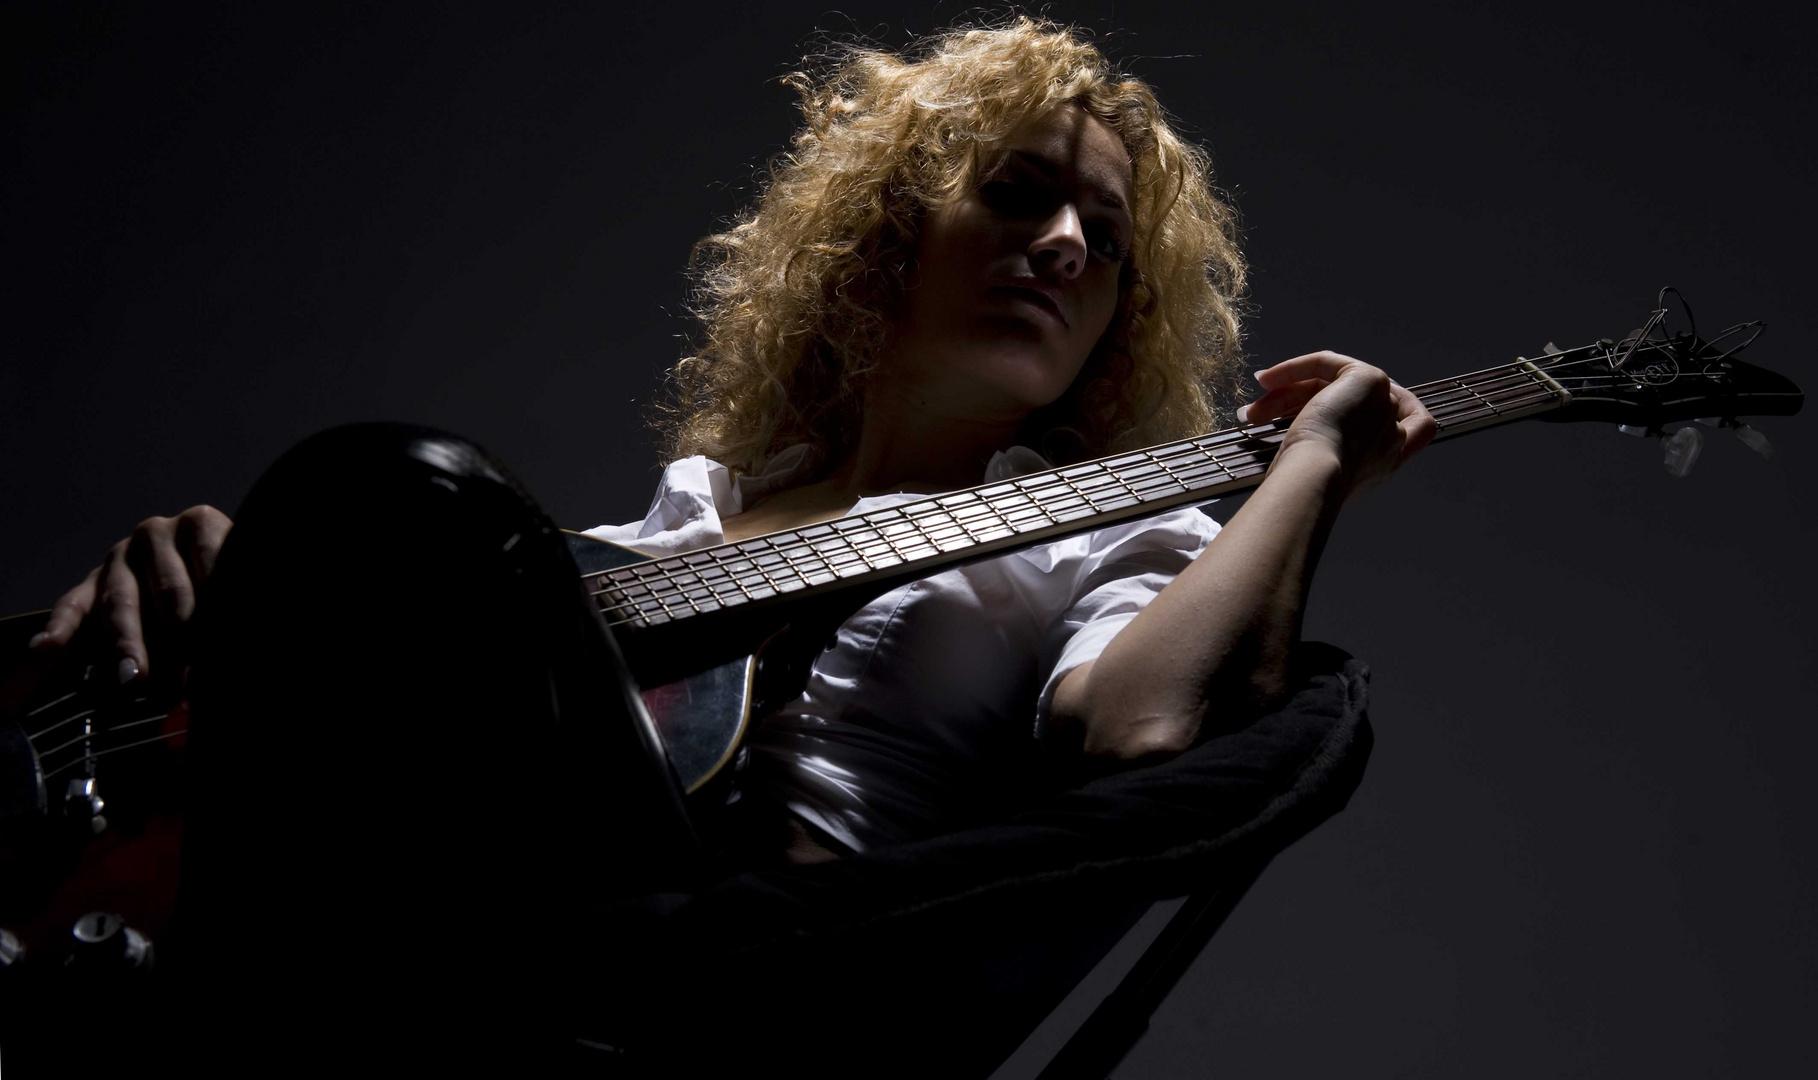 girl'n'bass